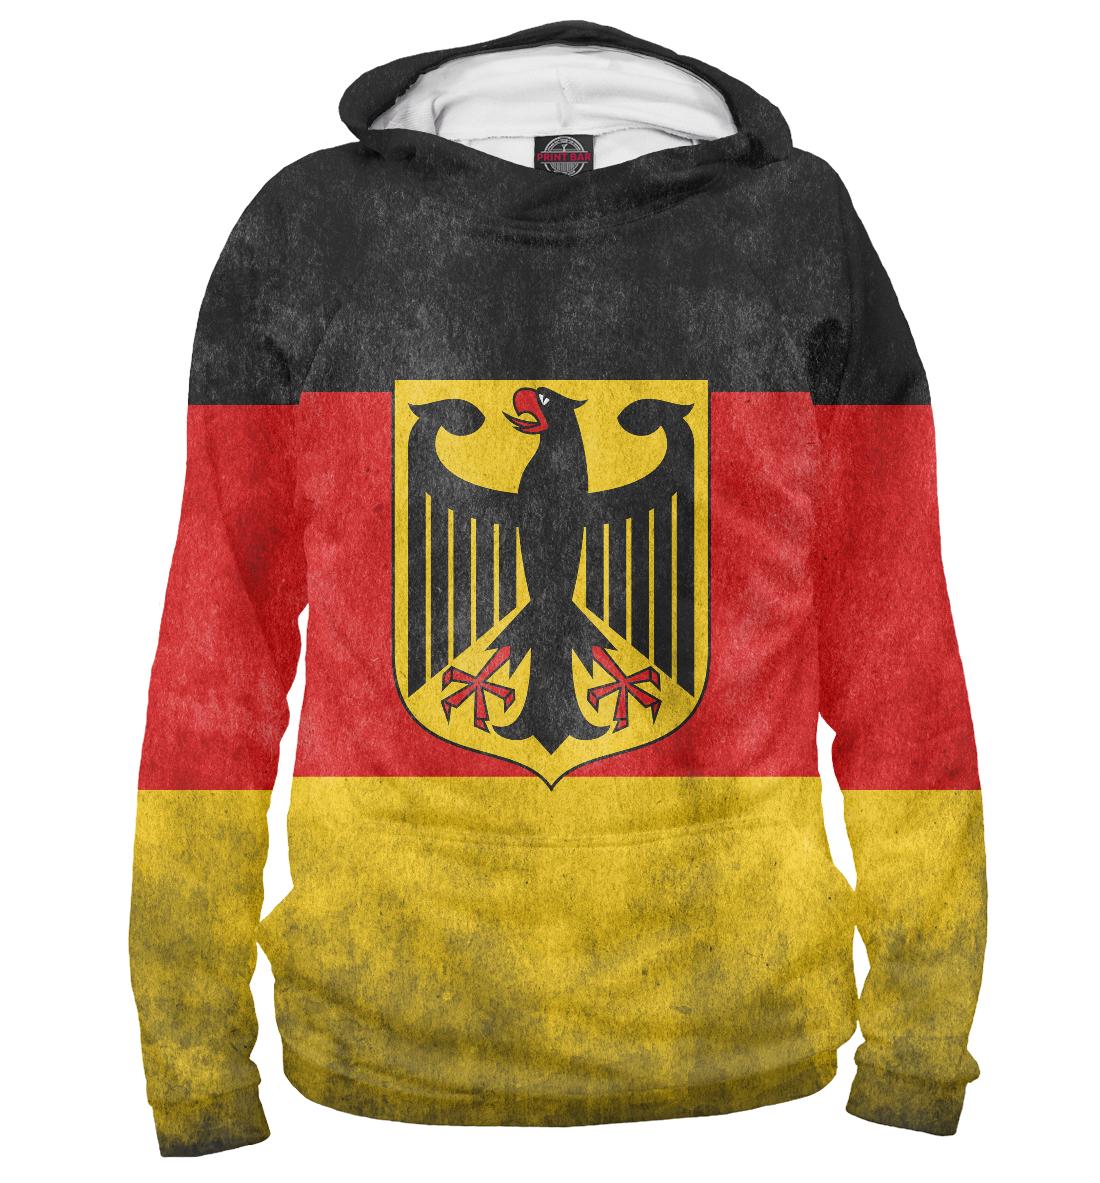 Купить Флаг Германии, Printbar, Худи, CTS-391031-hud-2